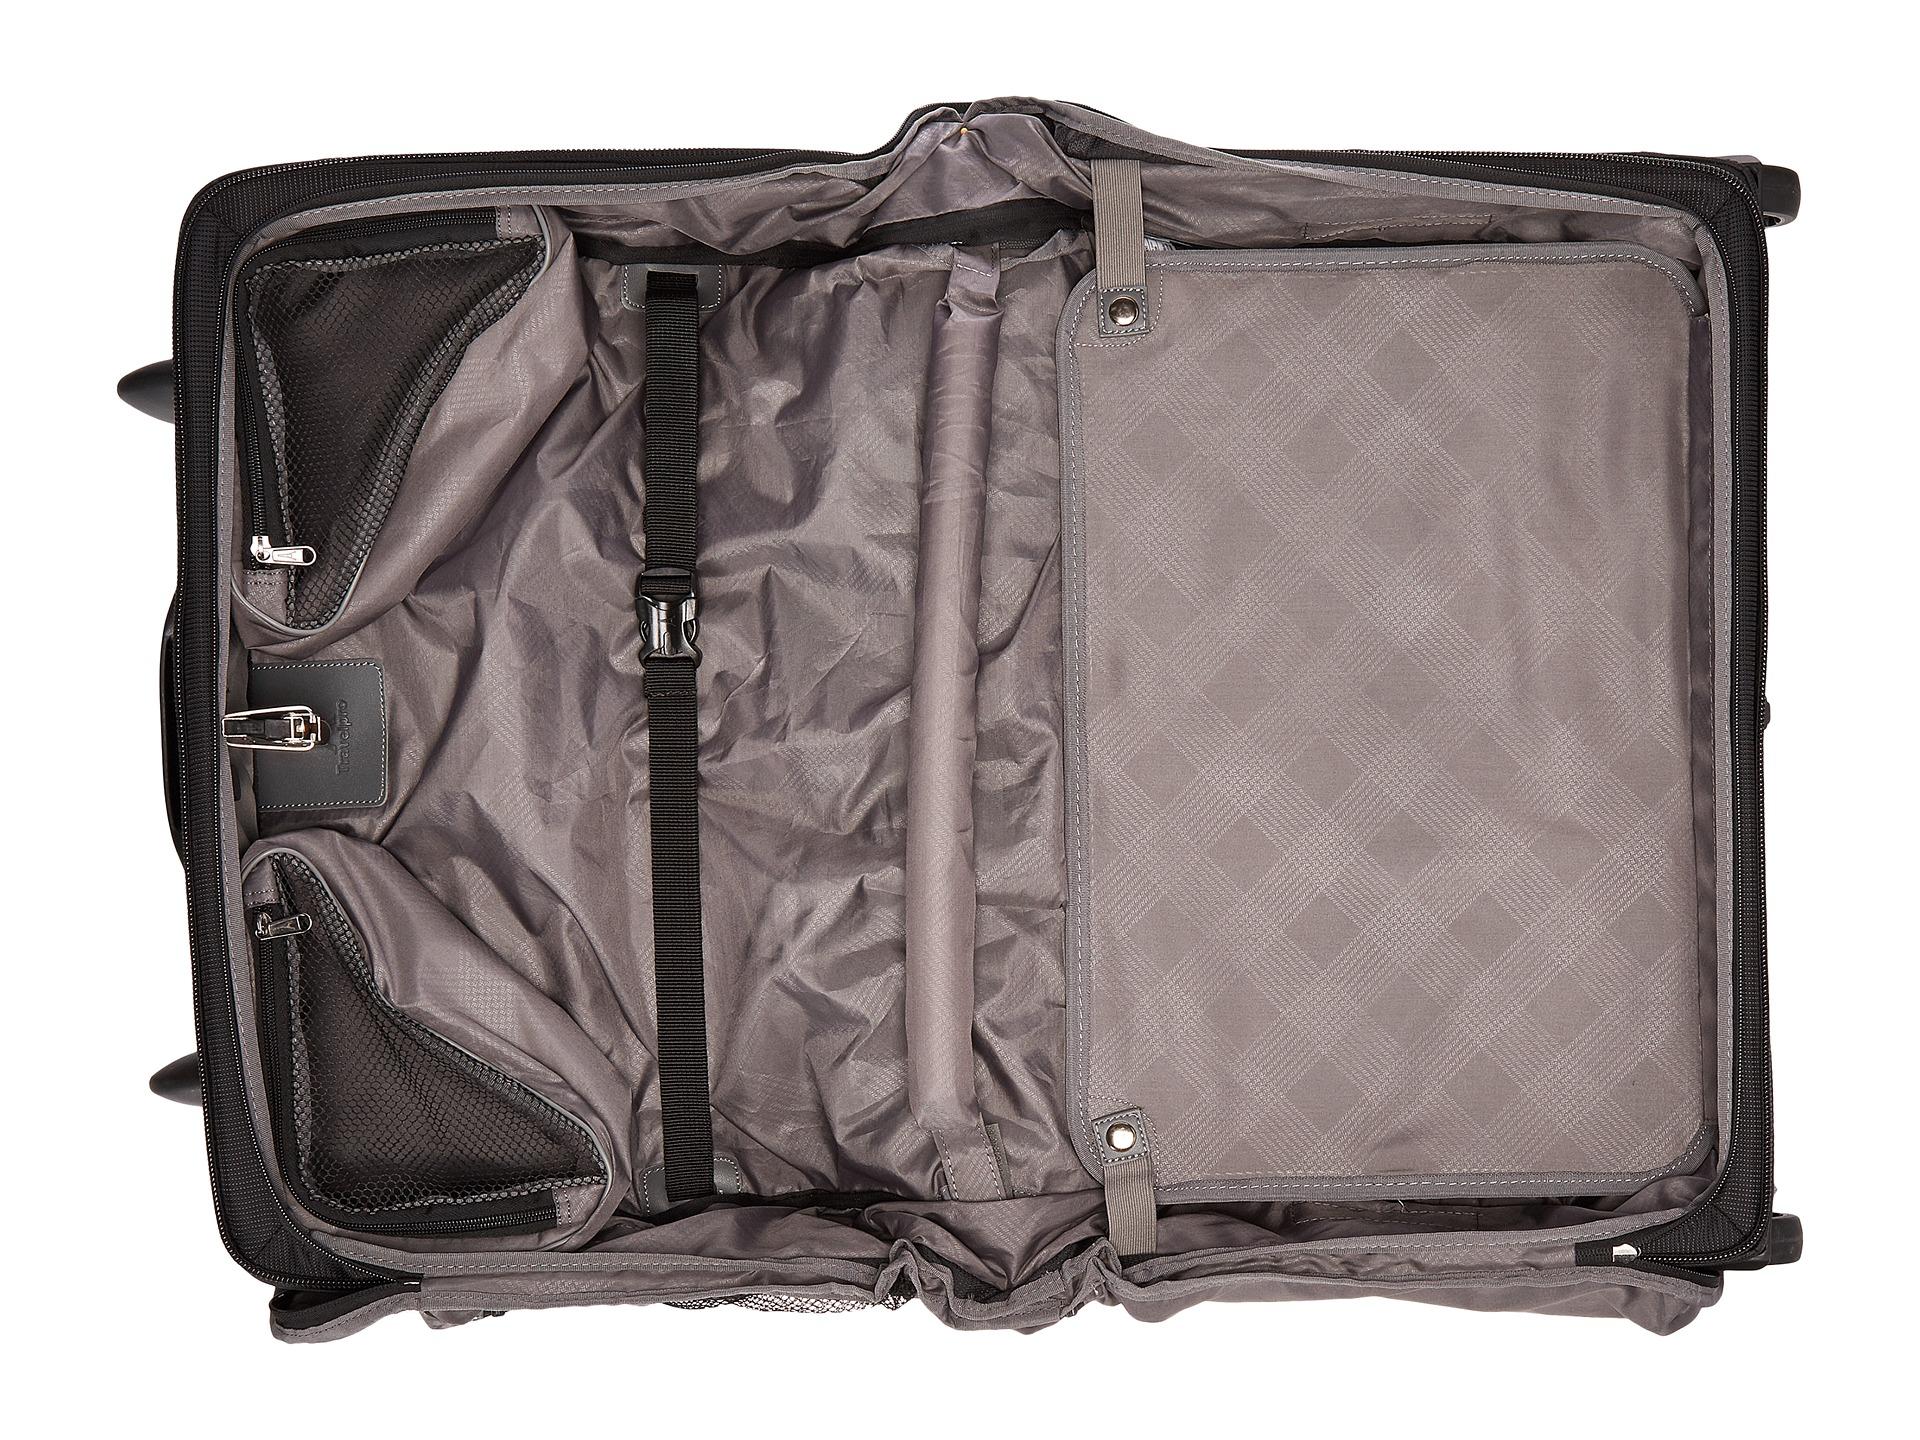 Travelpro maxlite 4 rolling carry on garment bag black for Wedding dress garment bag for air travel